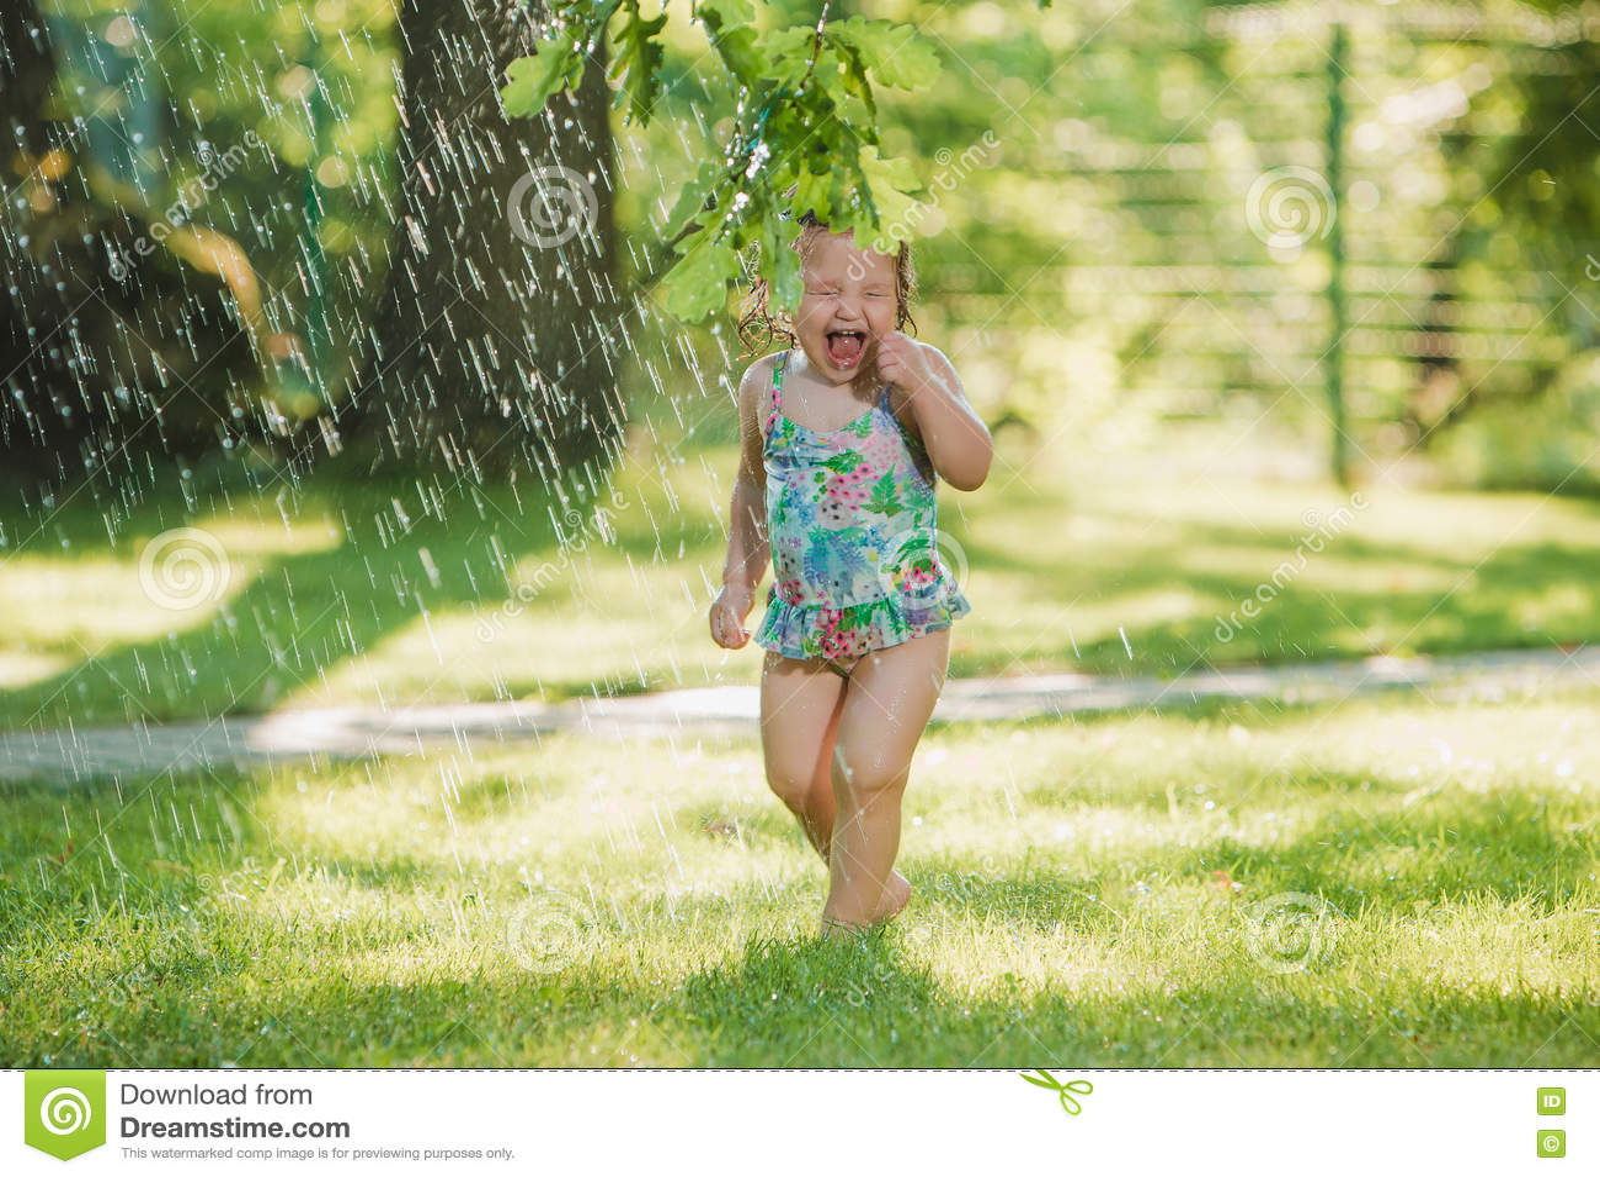 Humor in green grass running water